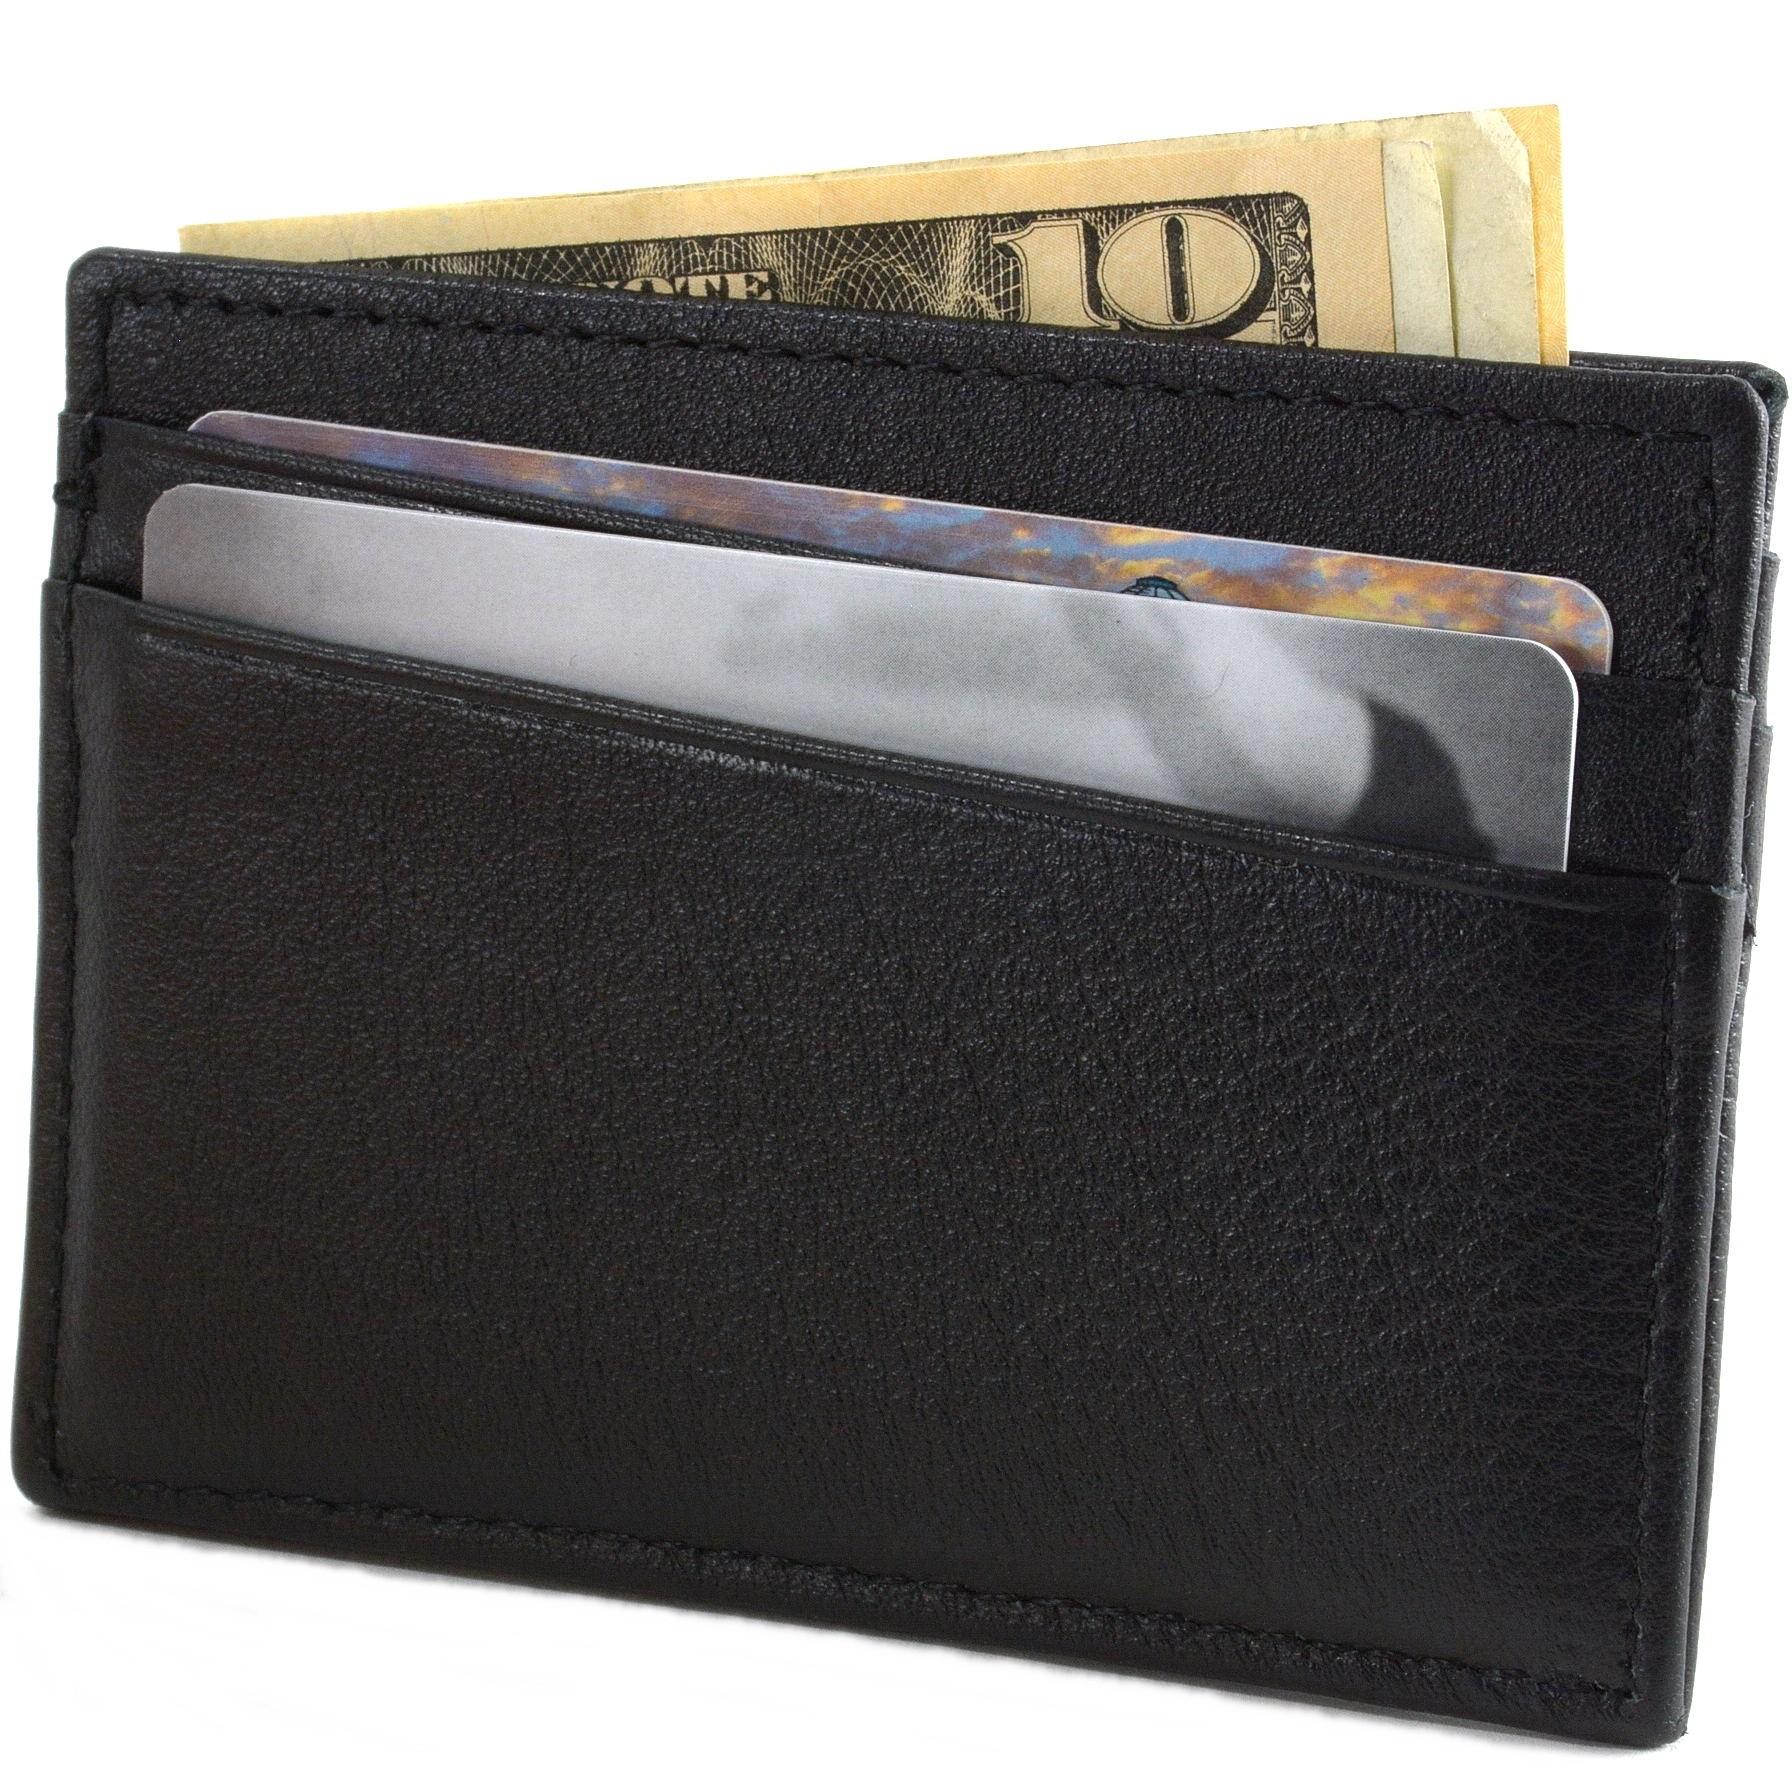 Alpine-Swiss-Minimalist-Leather-Front-Pocket-Wallet-5-Card-Slots-Slim-Thin-Case thumbnail 23